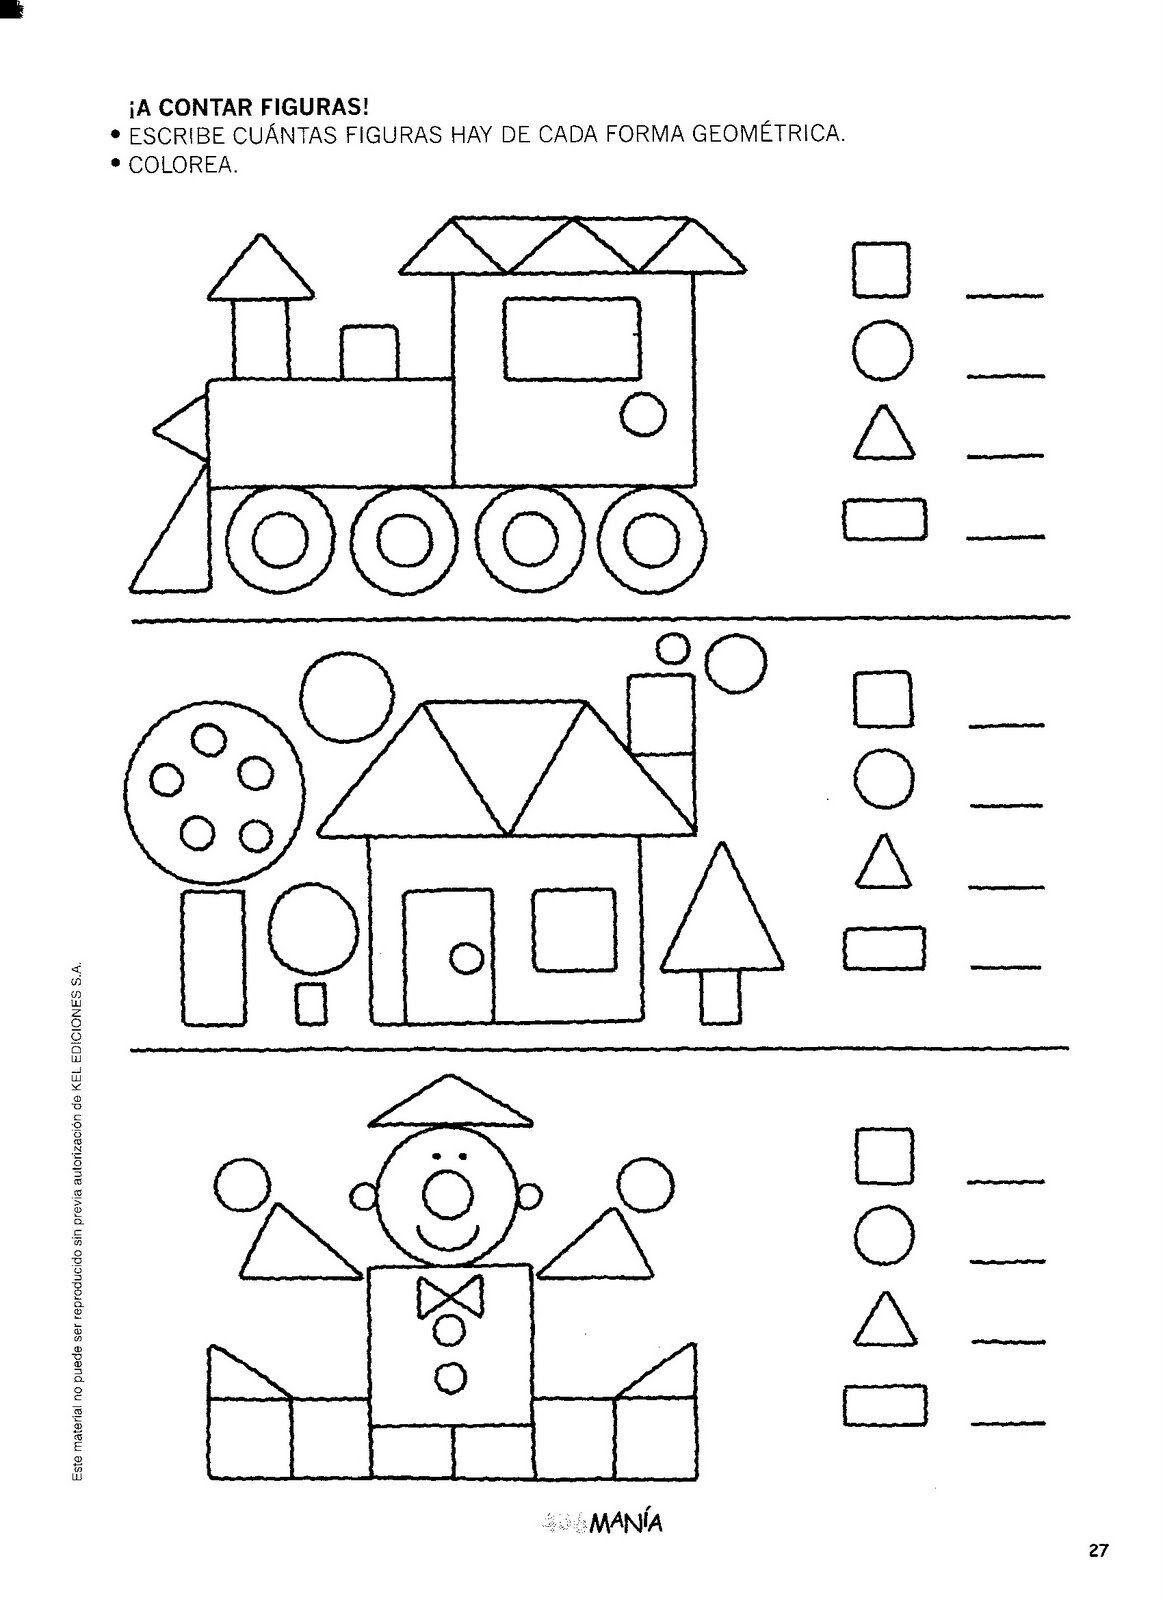 Pin by monica macias on numeromania | Pinterest | Homeschool